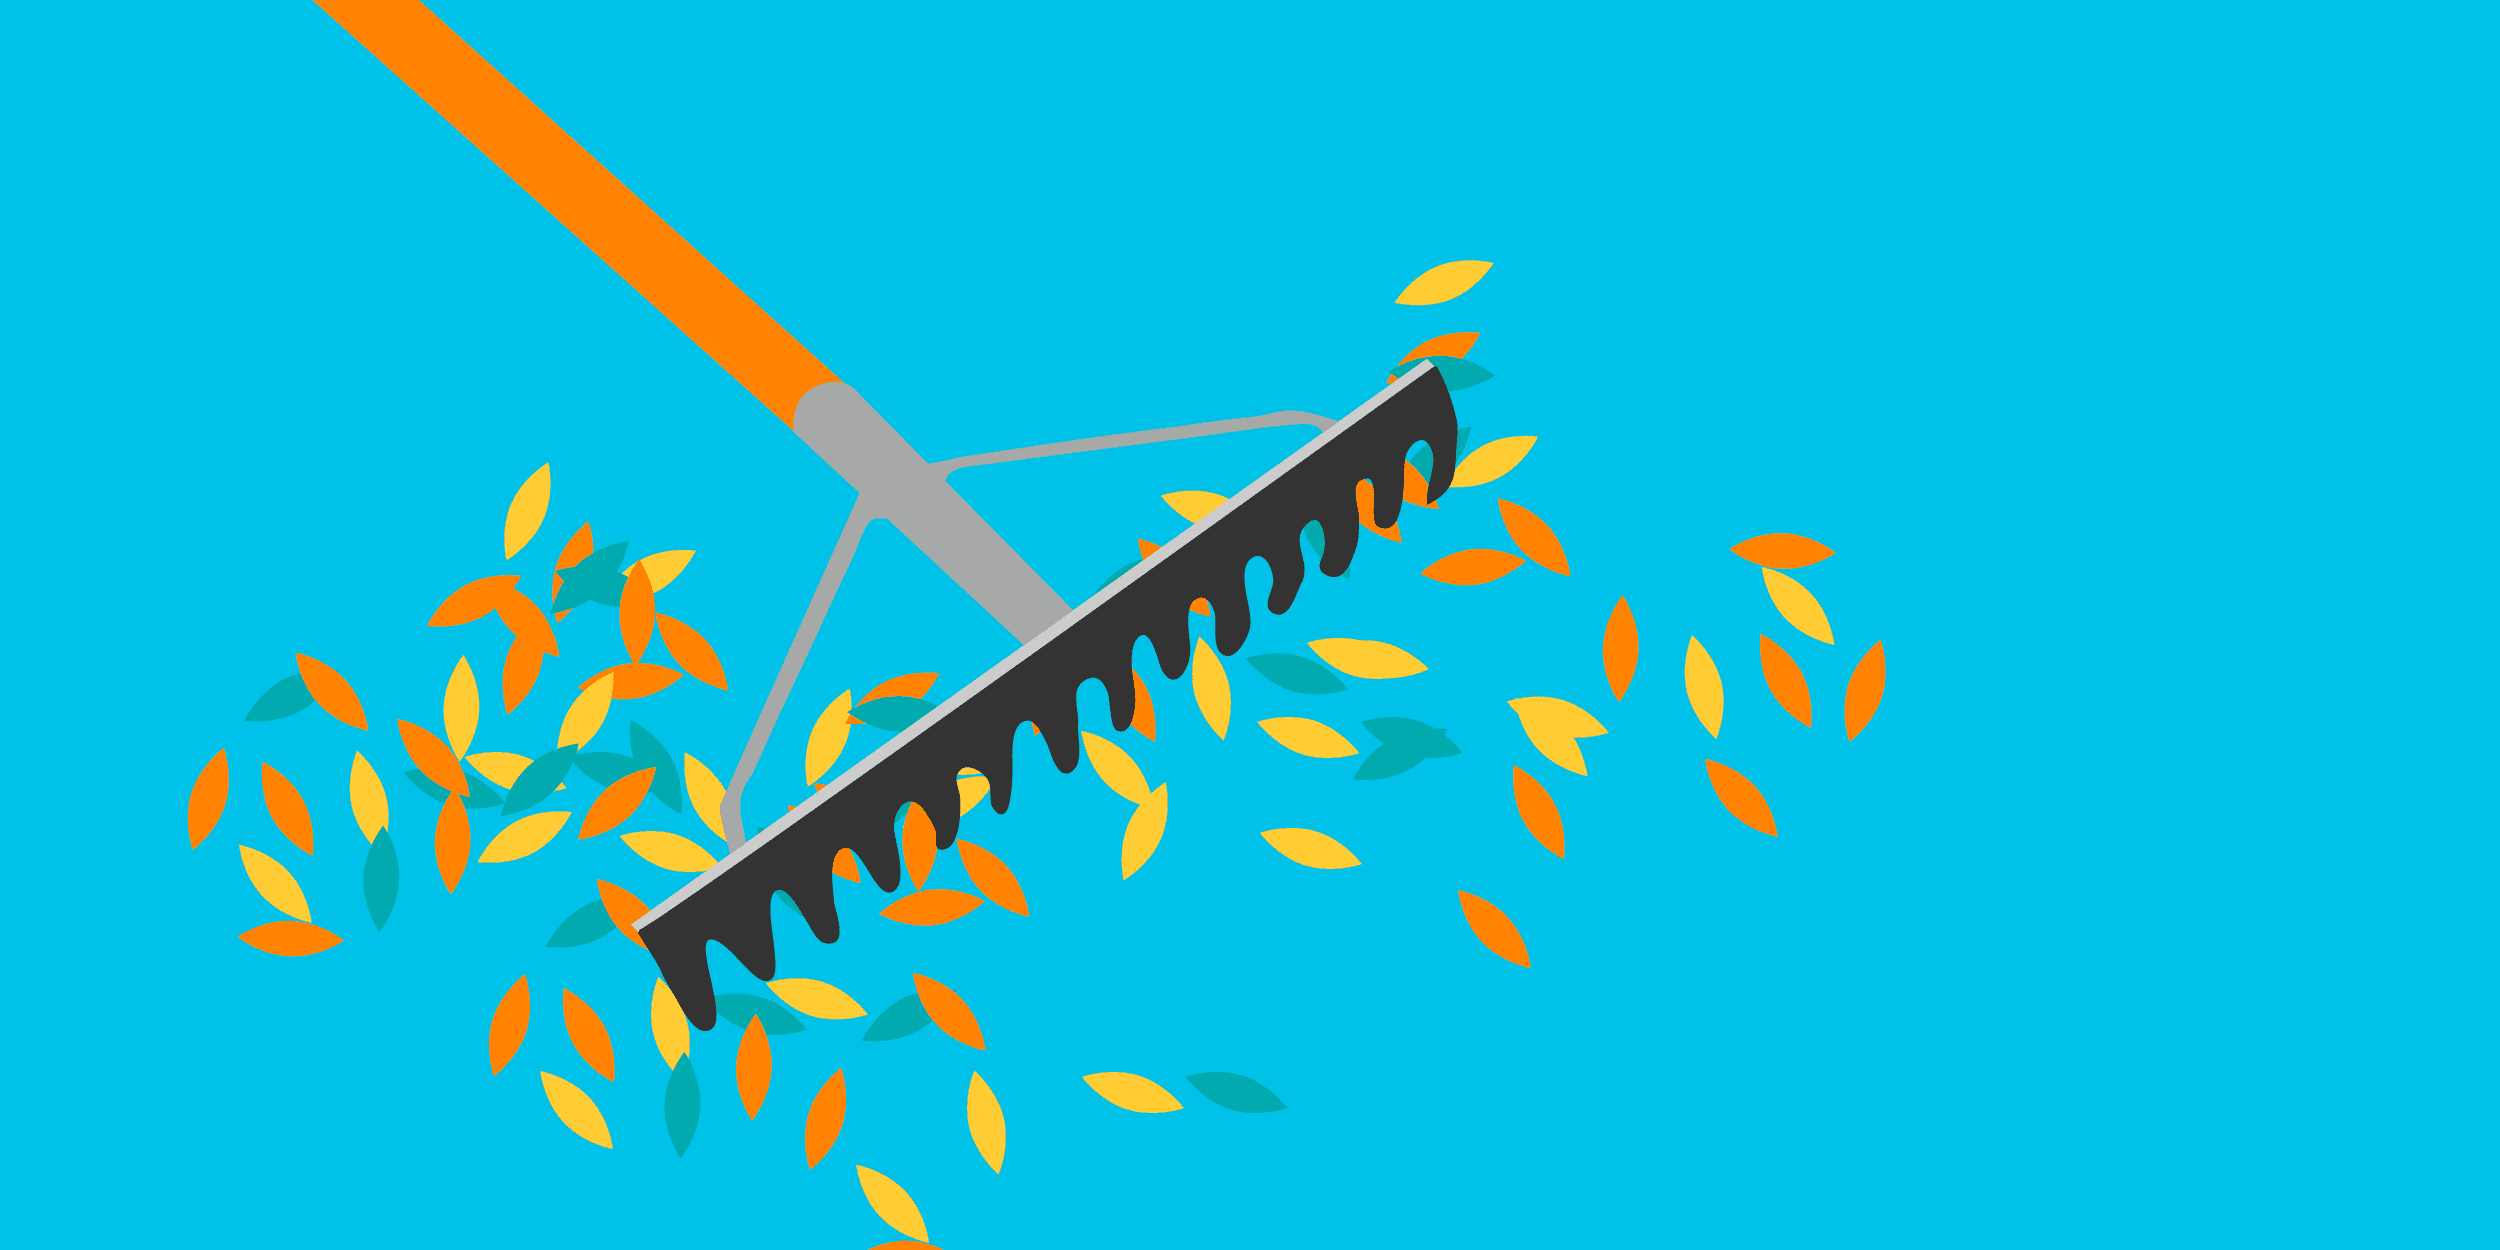 illustration of a rake gathering leaves, symbolizing raising more money for your nonprofit